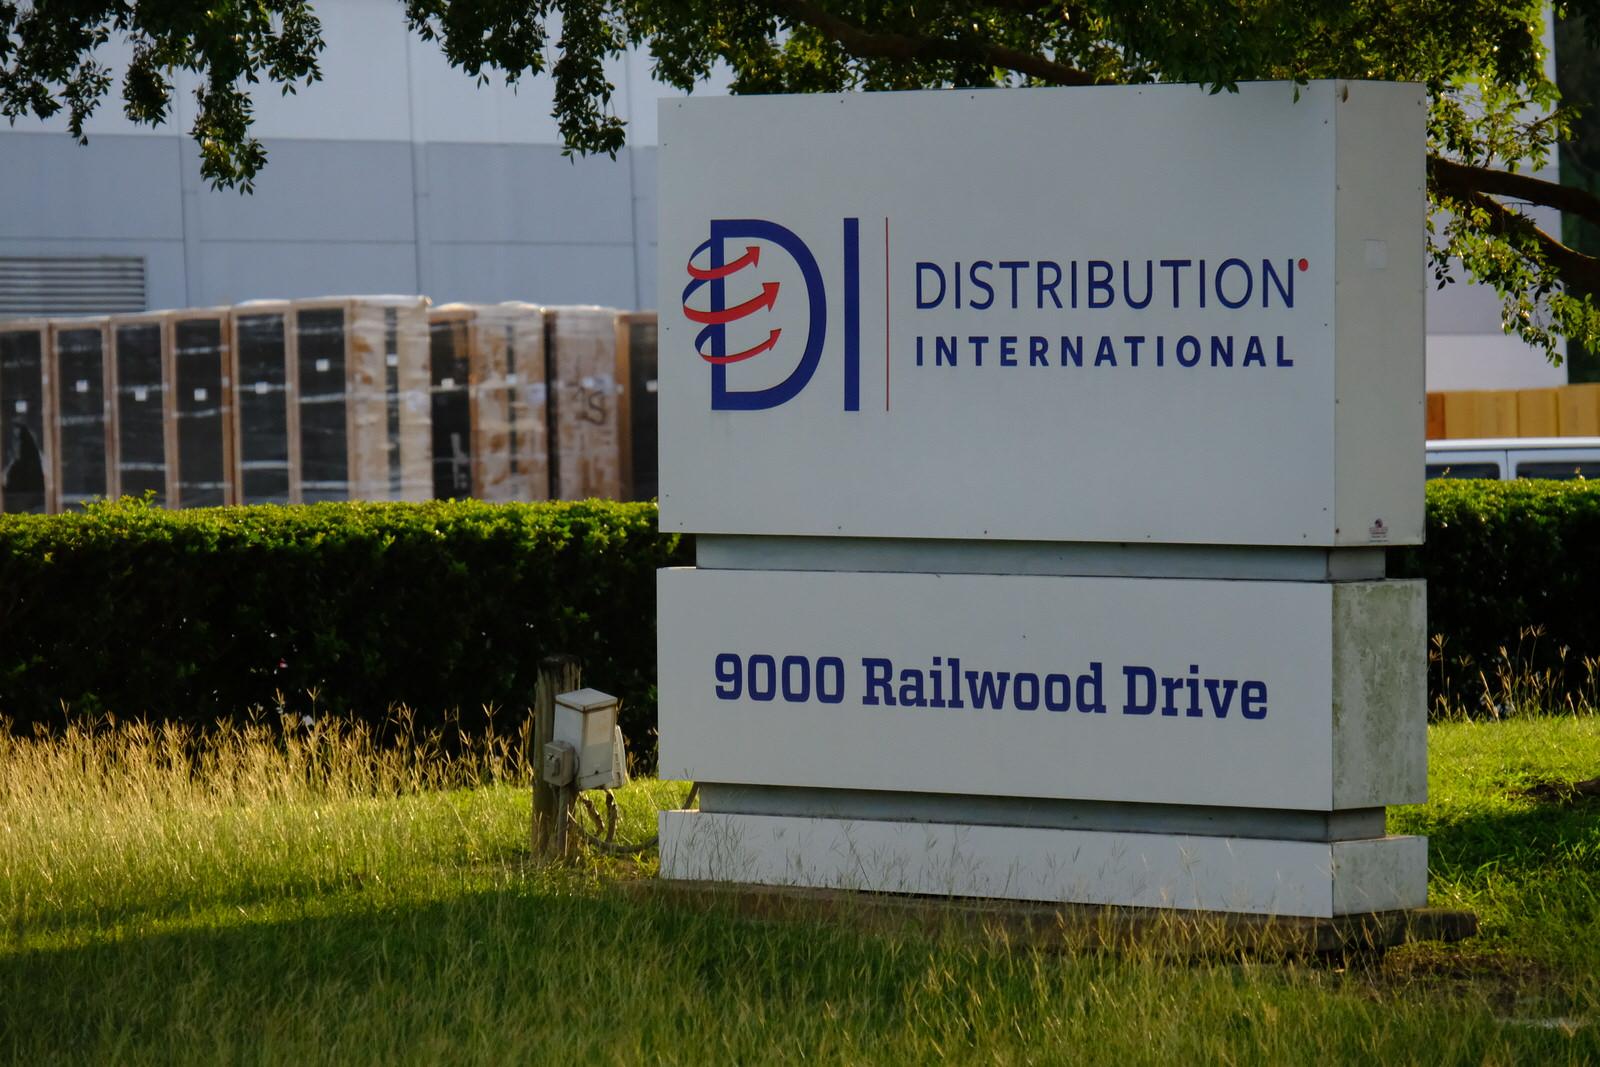 Distribution International distribution facility in Houston, Texas.